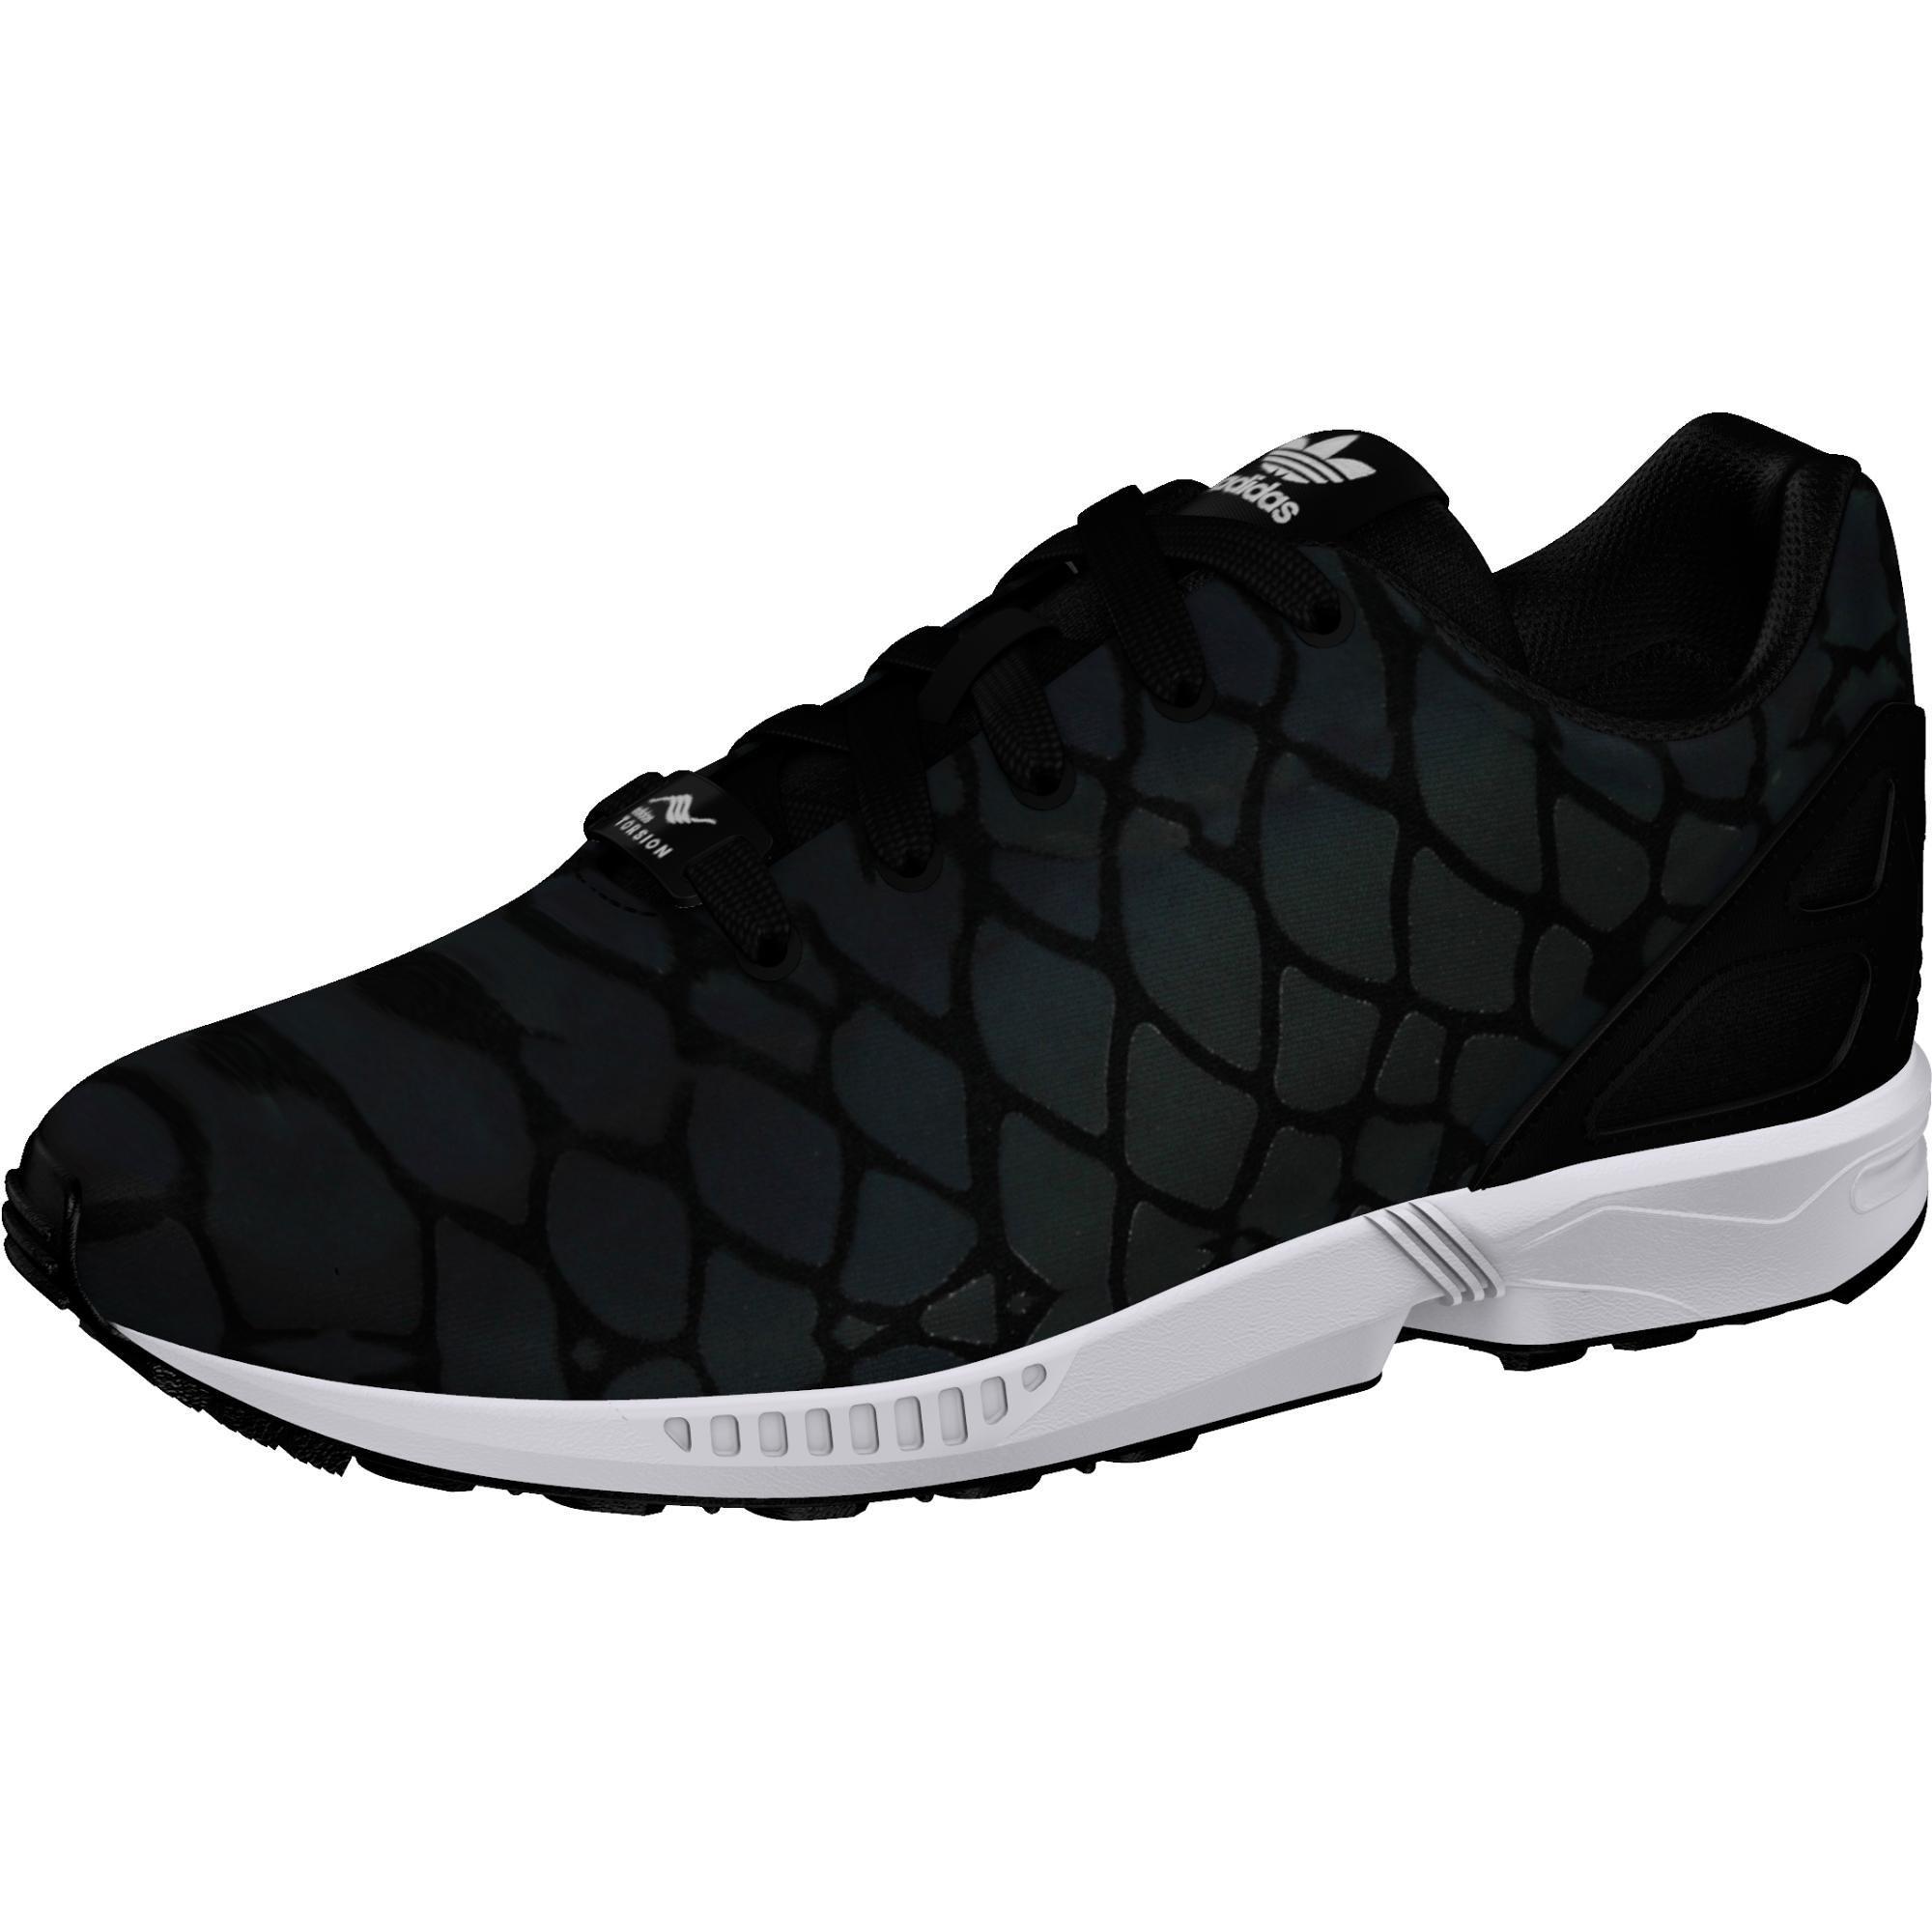 adidas Originals ZX Flux Xenopeltis K Black Mesh Youth